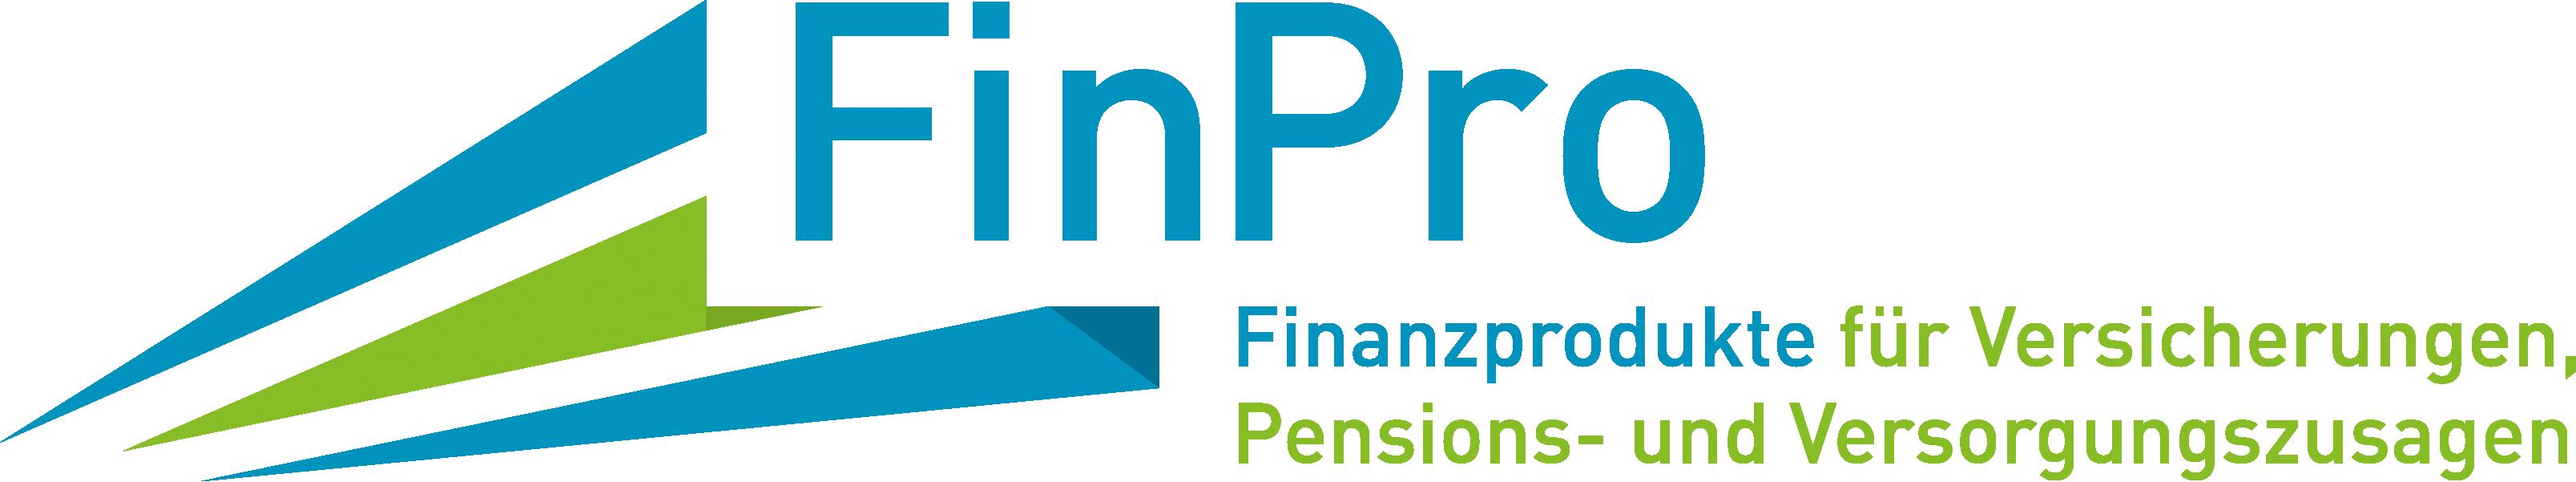 02.-03.09.2020 – FinPro® 2020, Bergisch Gladbach